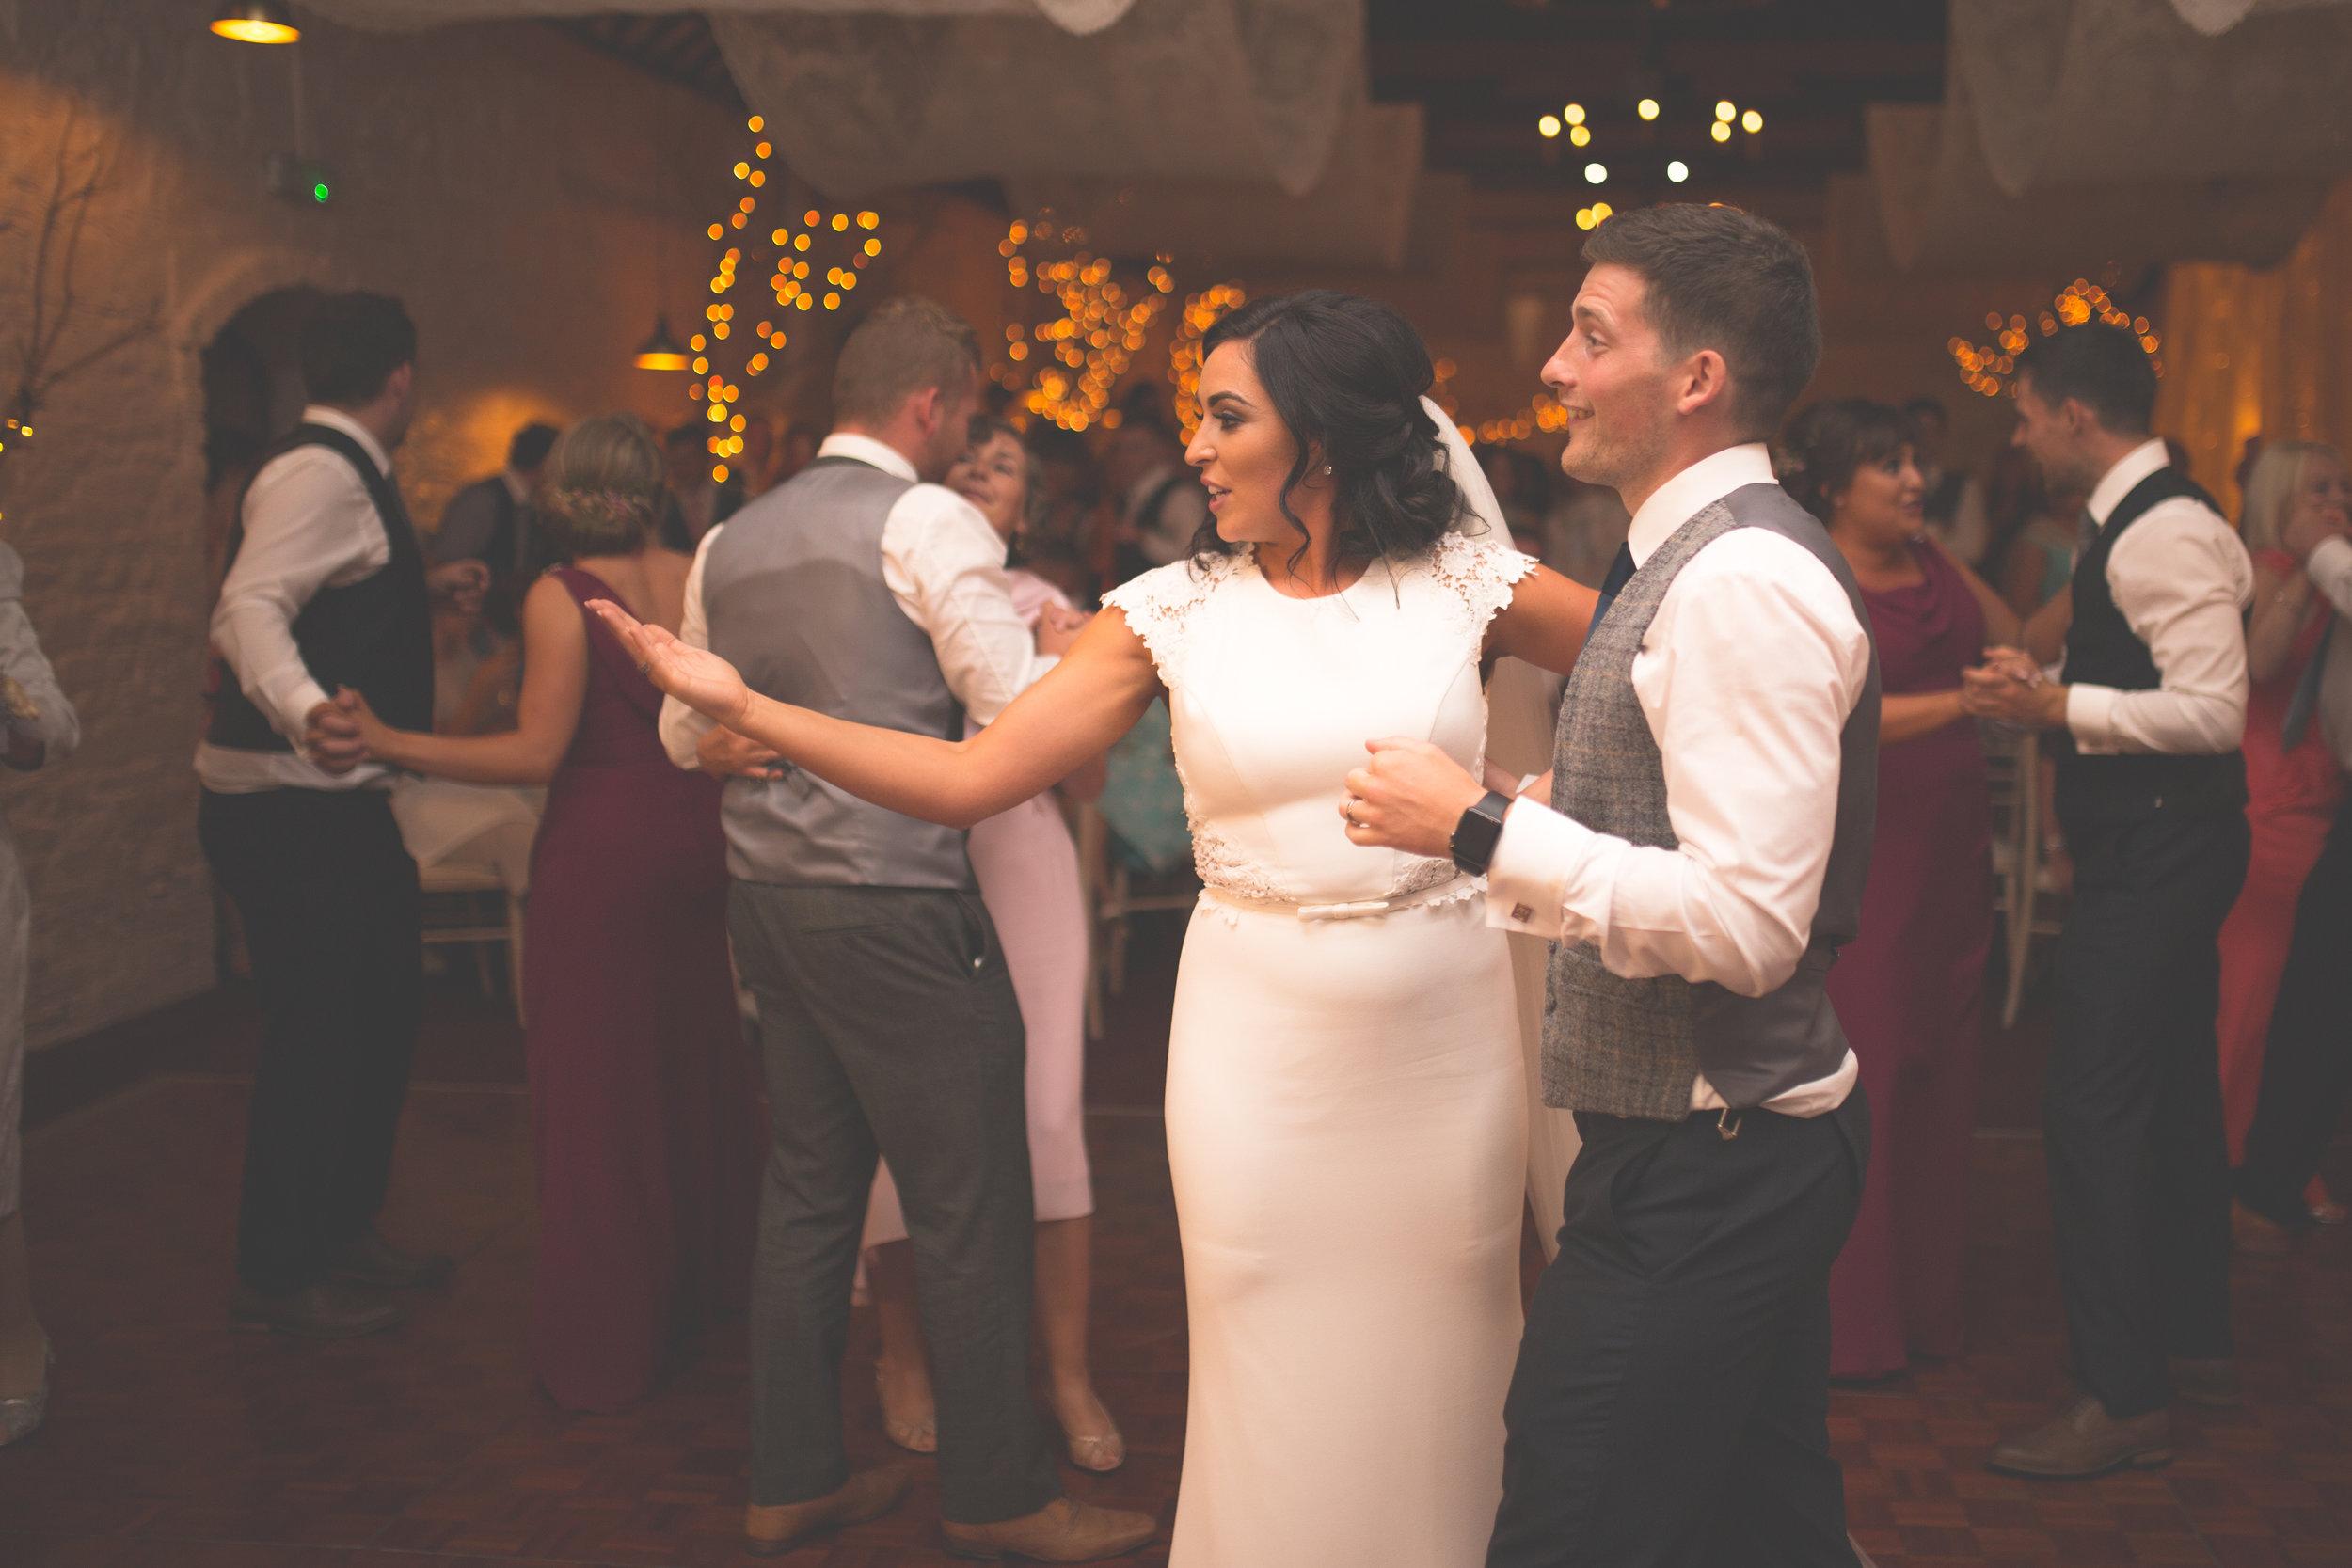 Brian McEwan Wedding Photography | Carol-Annee & Sean | The Dancing-56.jpg